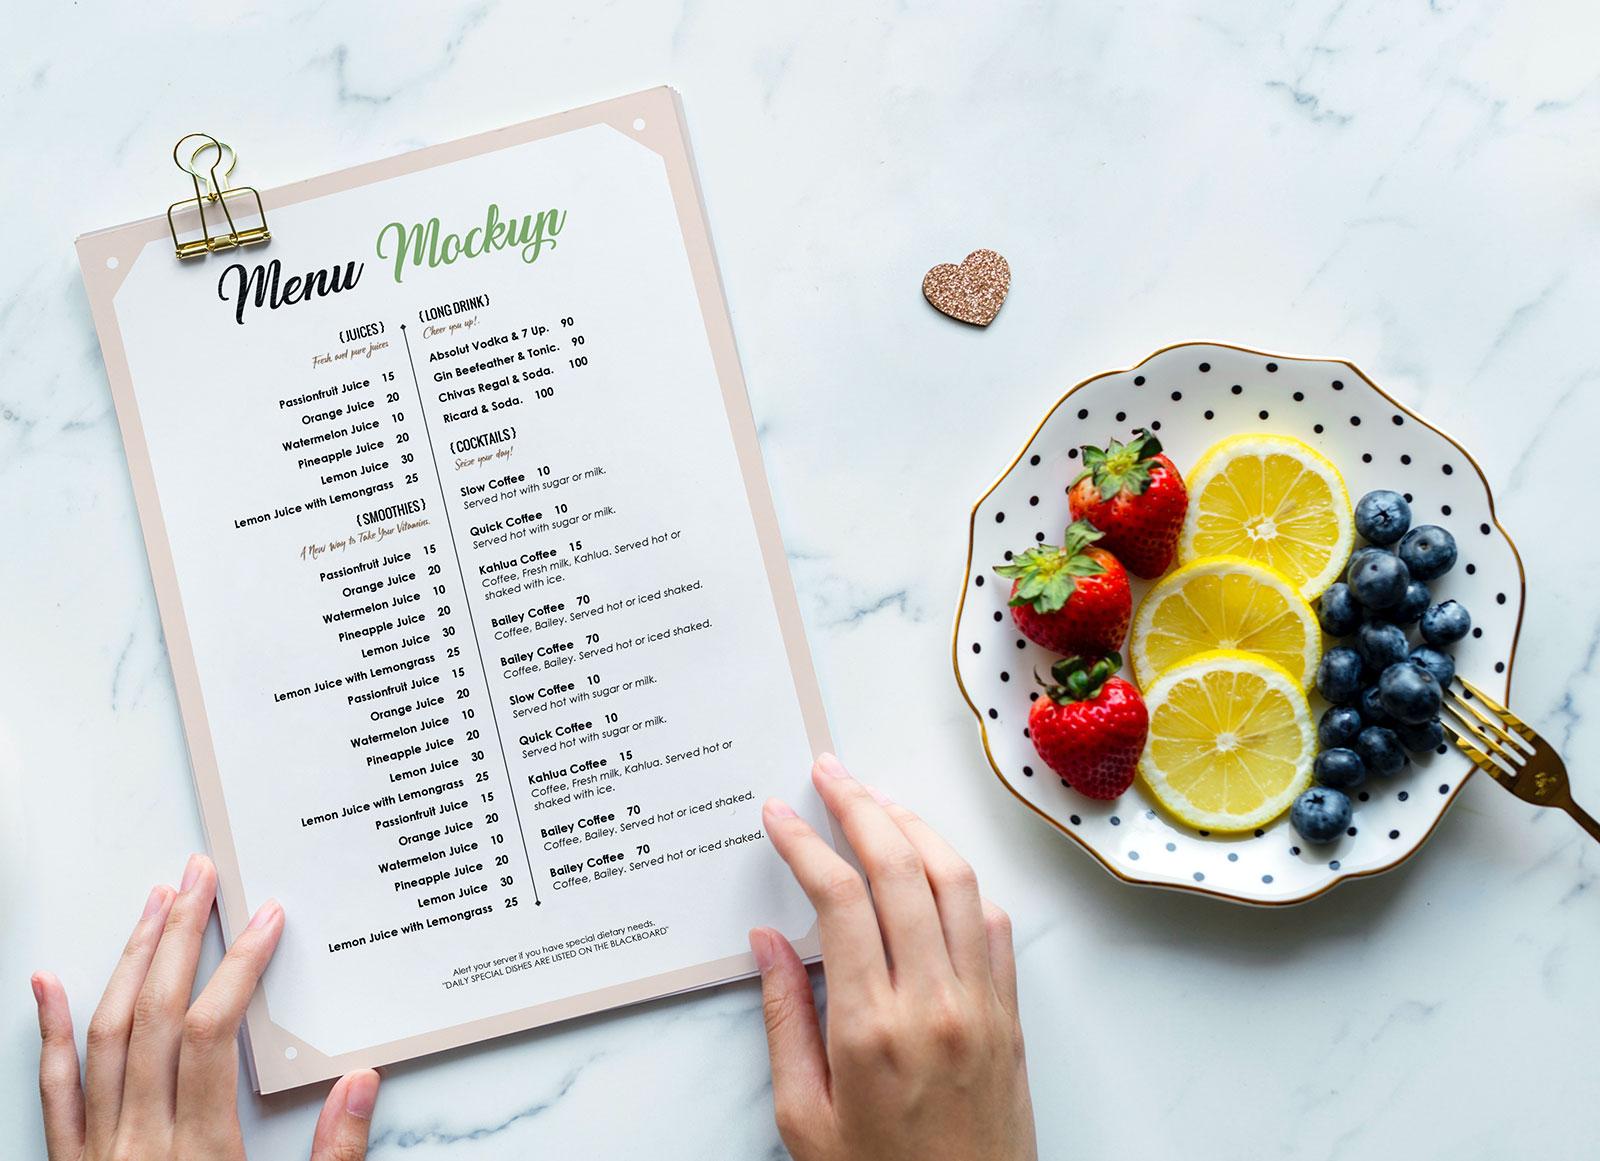 Free-Restaurant-Menu-Flyer-Mockup-PSD